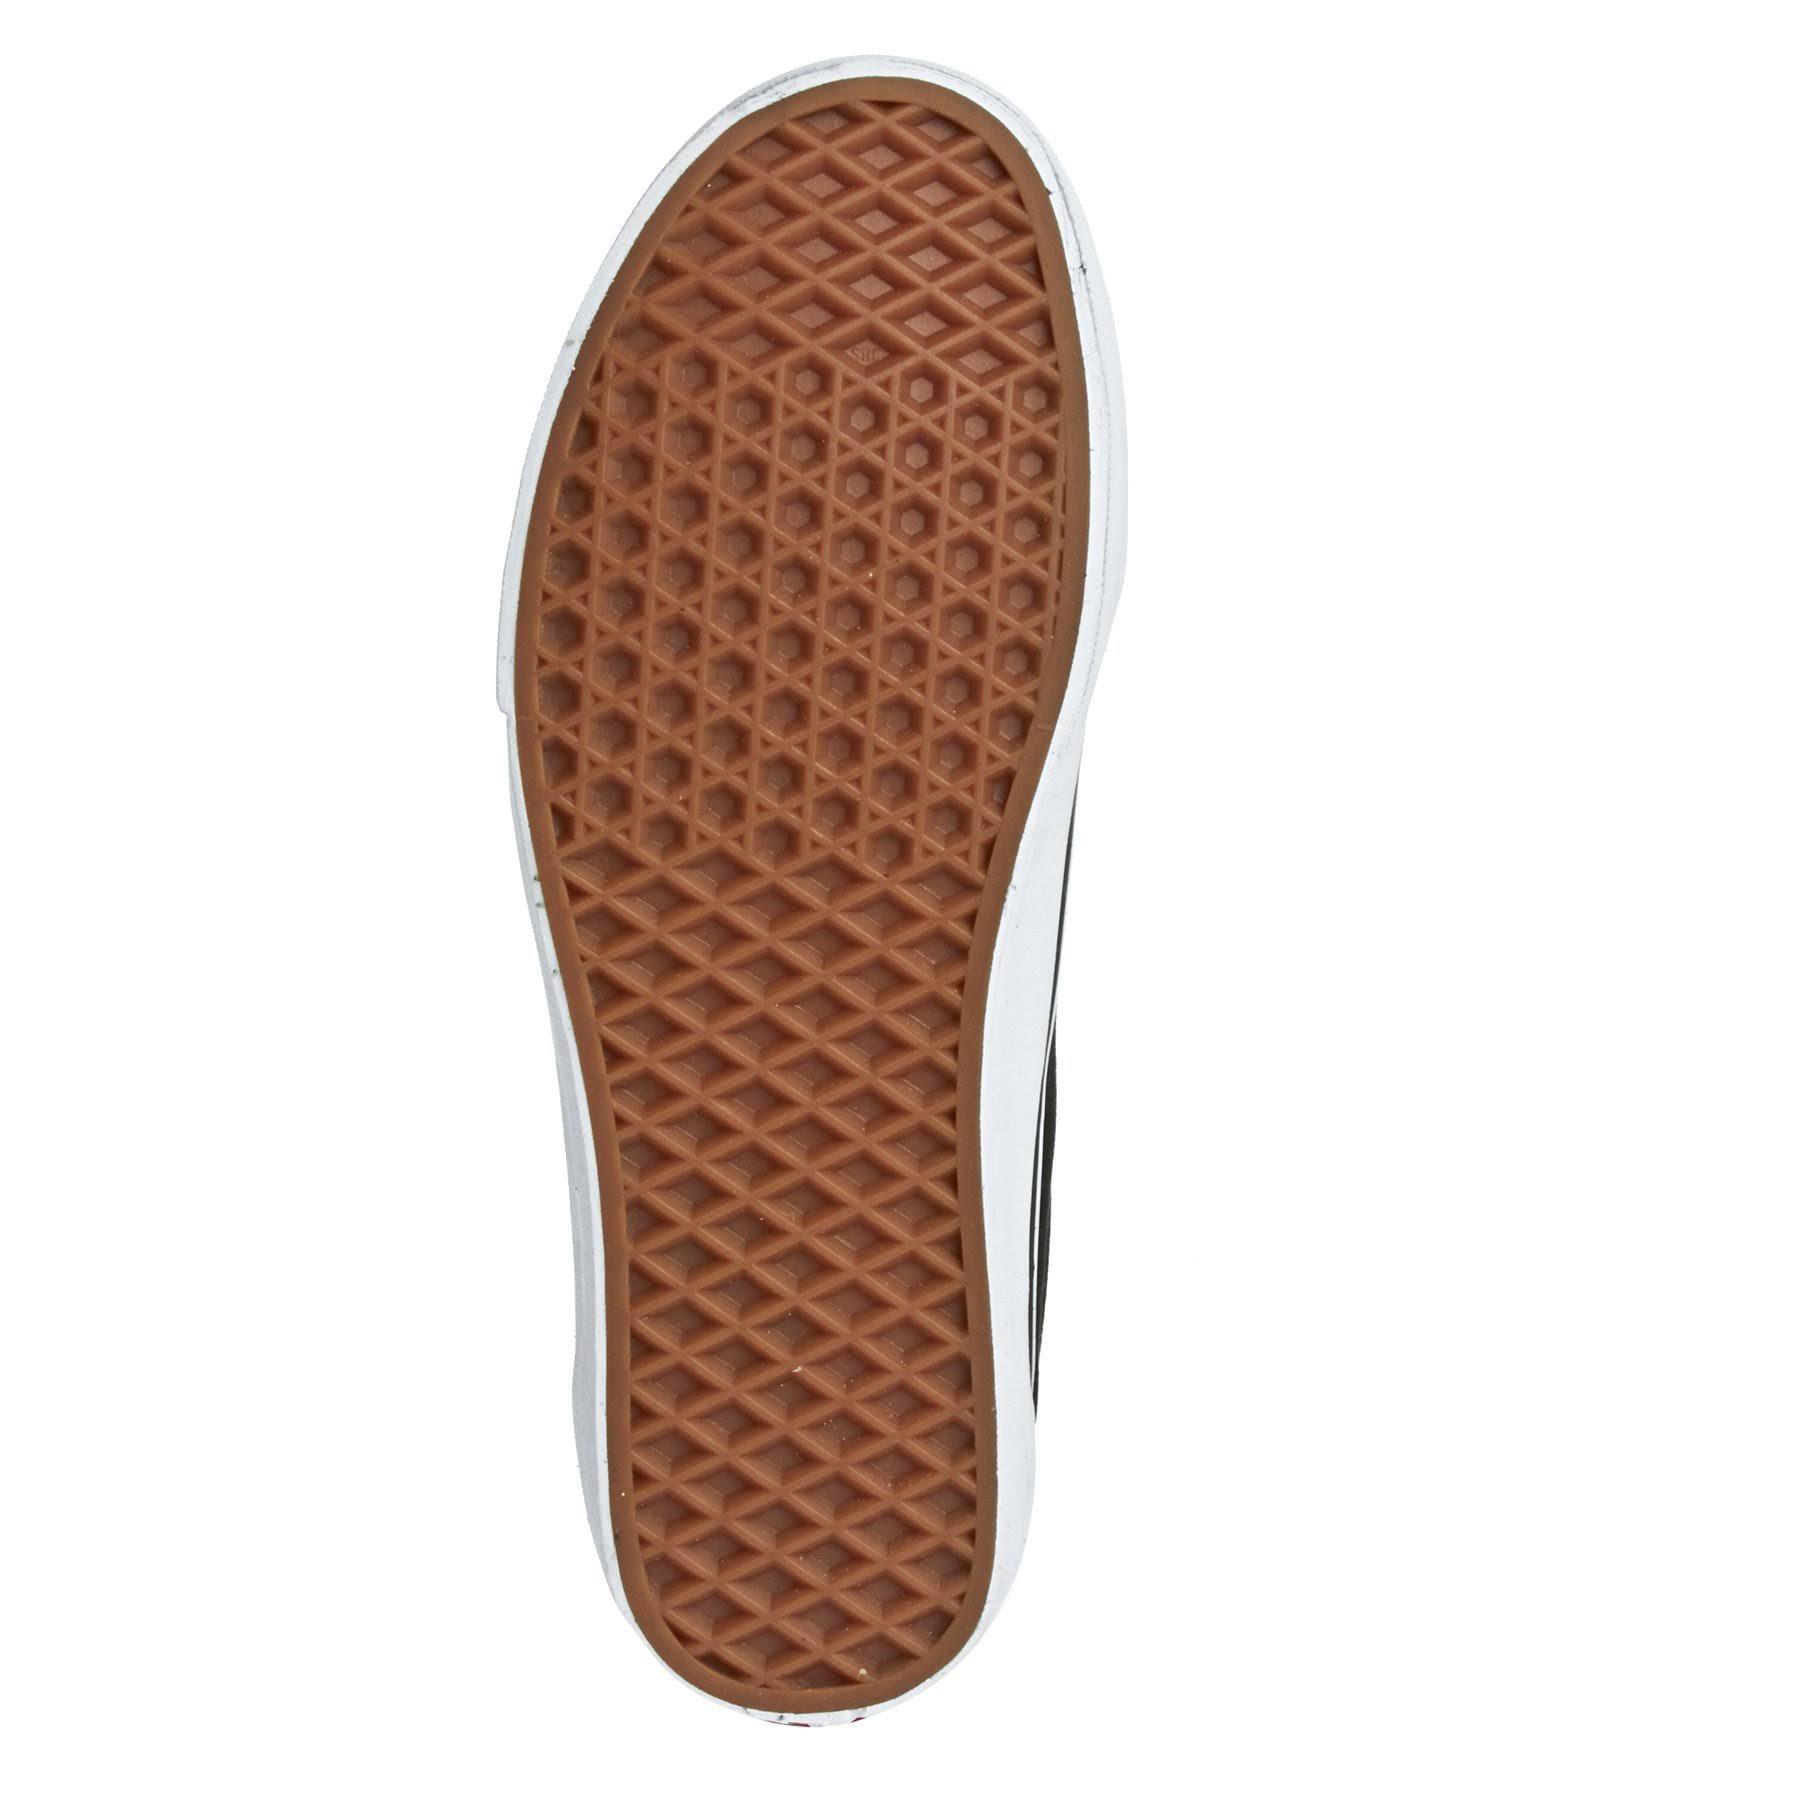 Shoes Hombres Tamaño 9 Original Blanco Negro Classic Old negro Skool Vans qWI0Ex